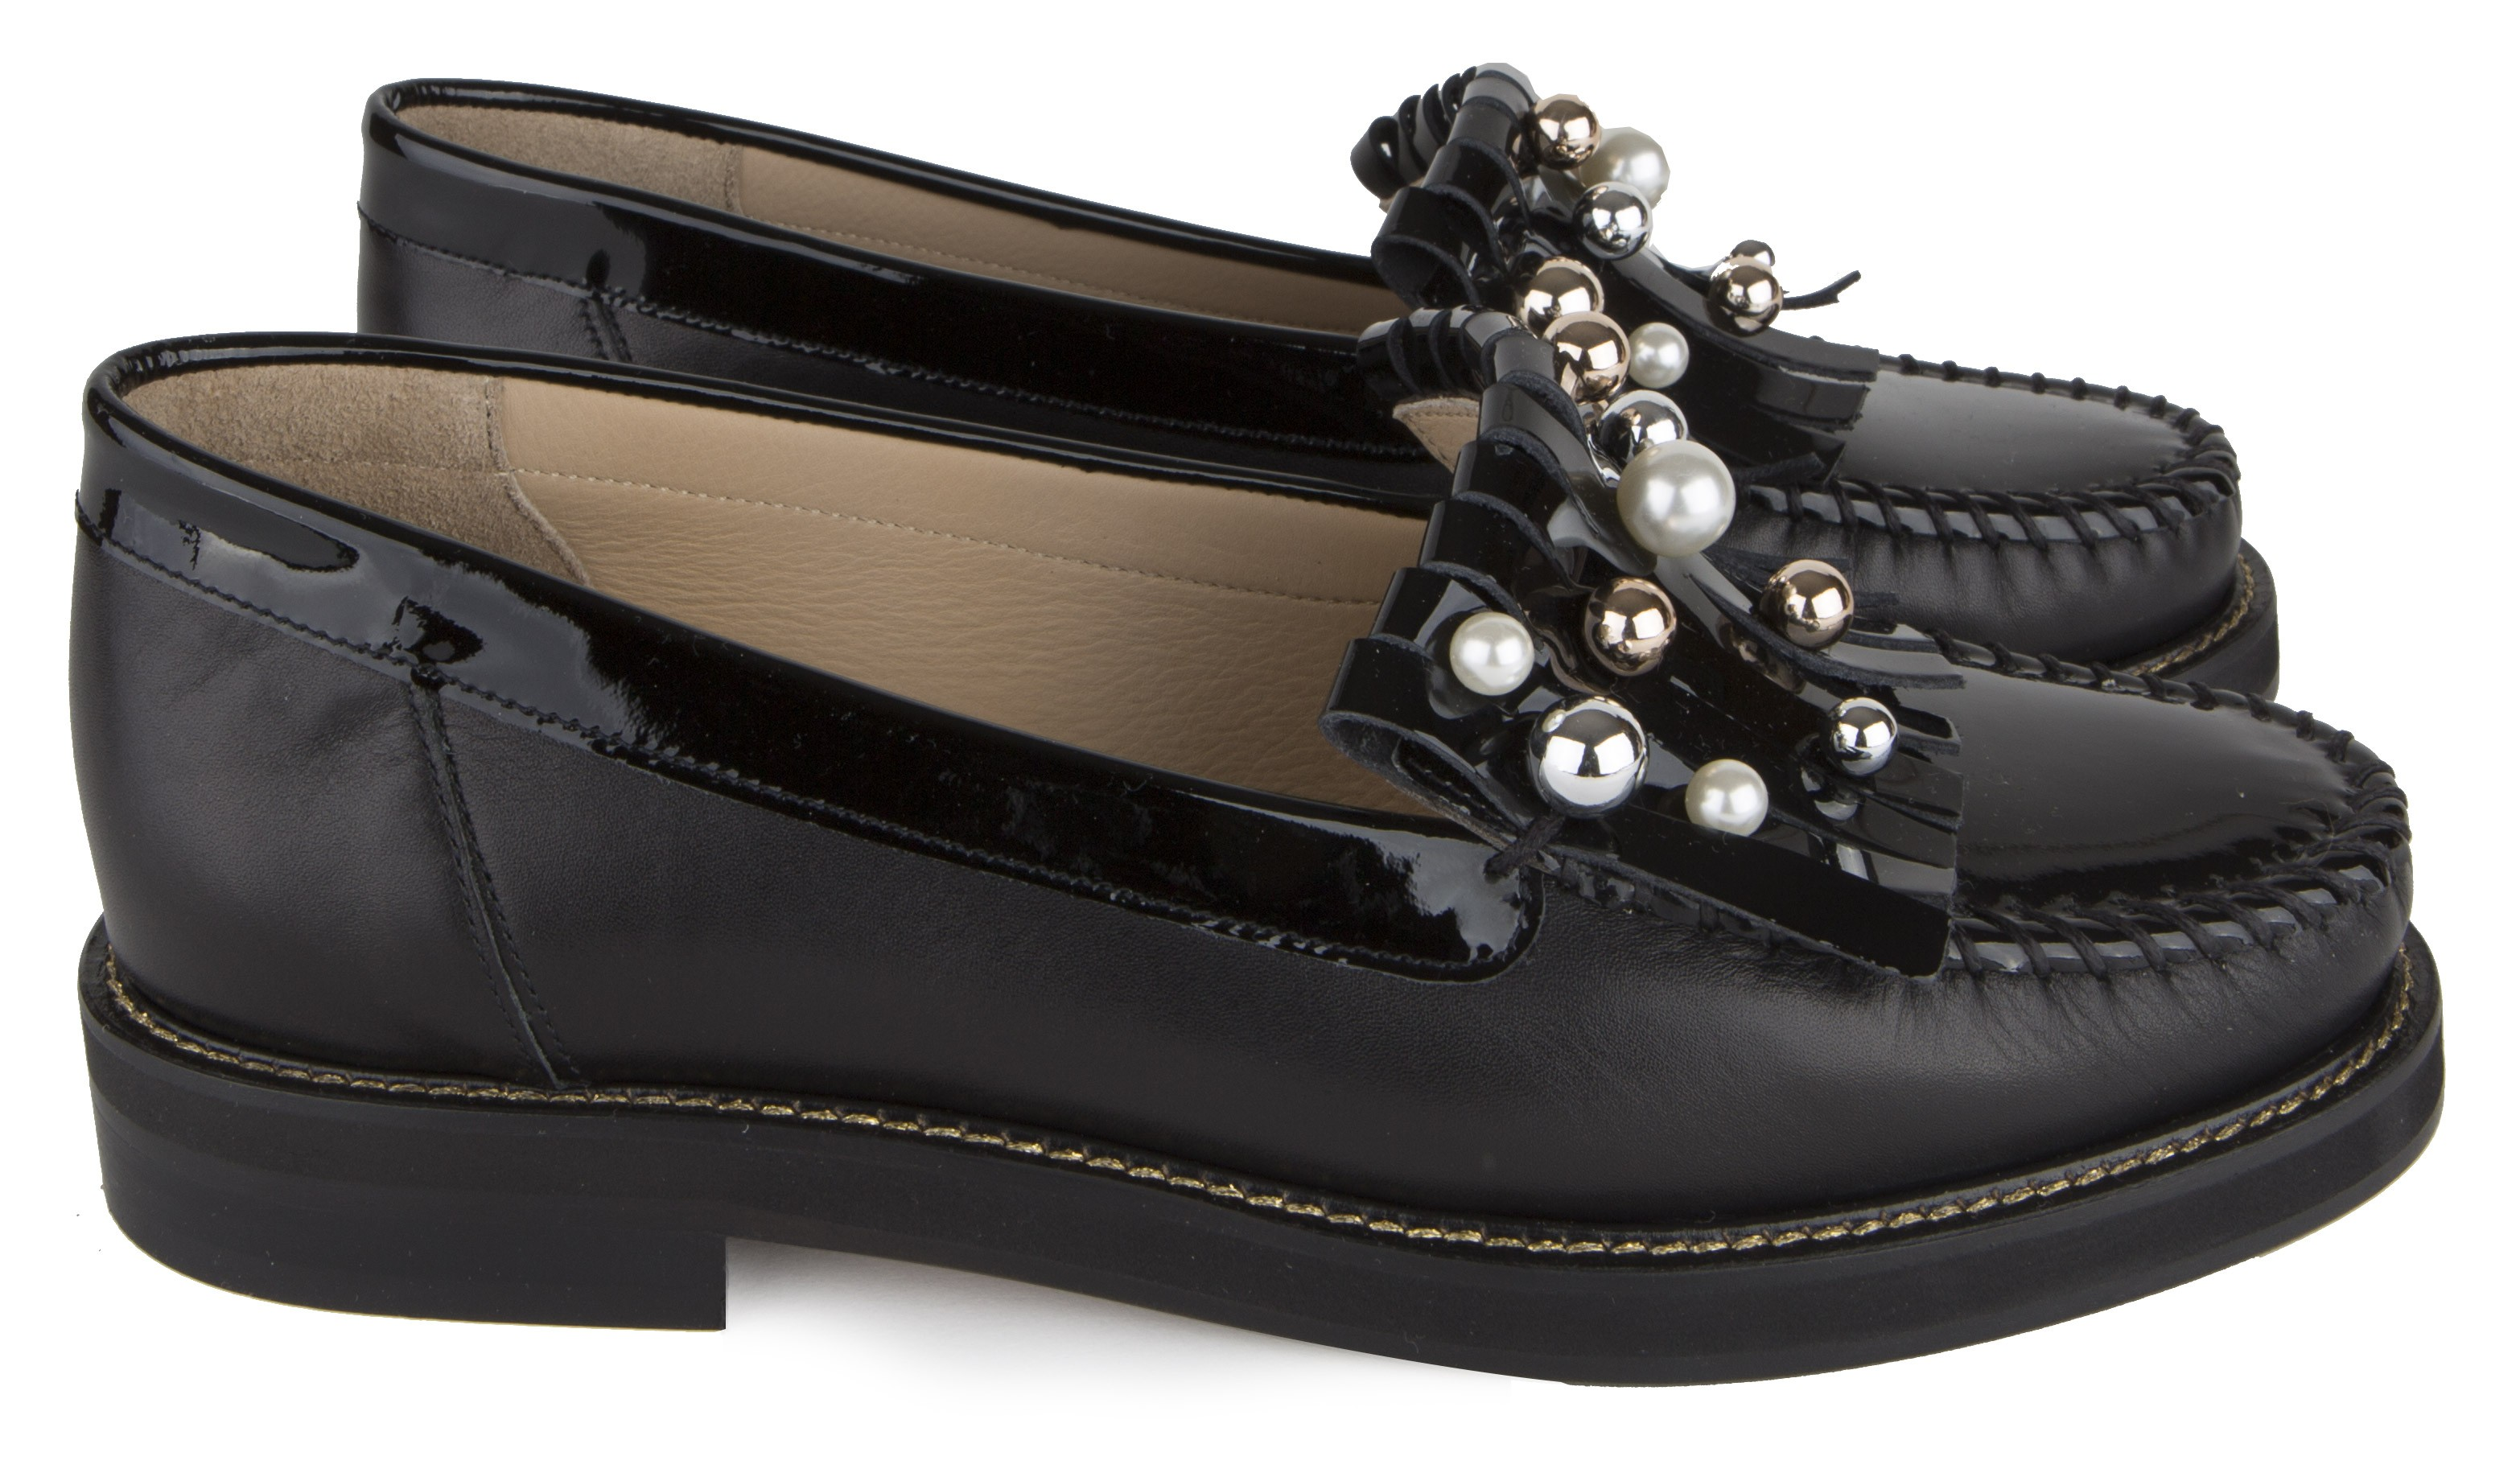 Nos Cuir Chaussures Maurice Manufacture Femme En Nmnv80w